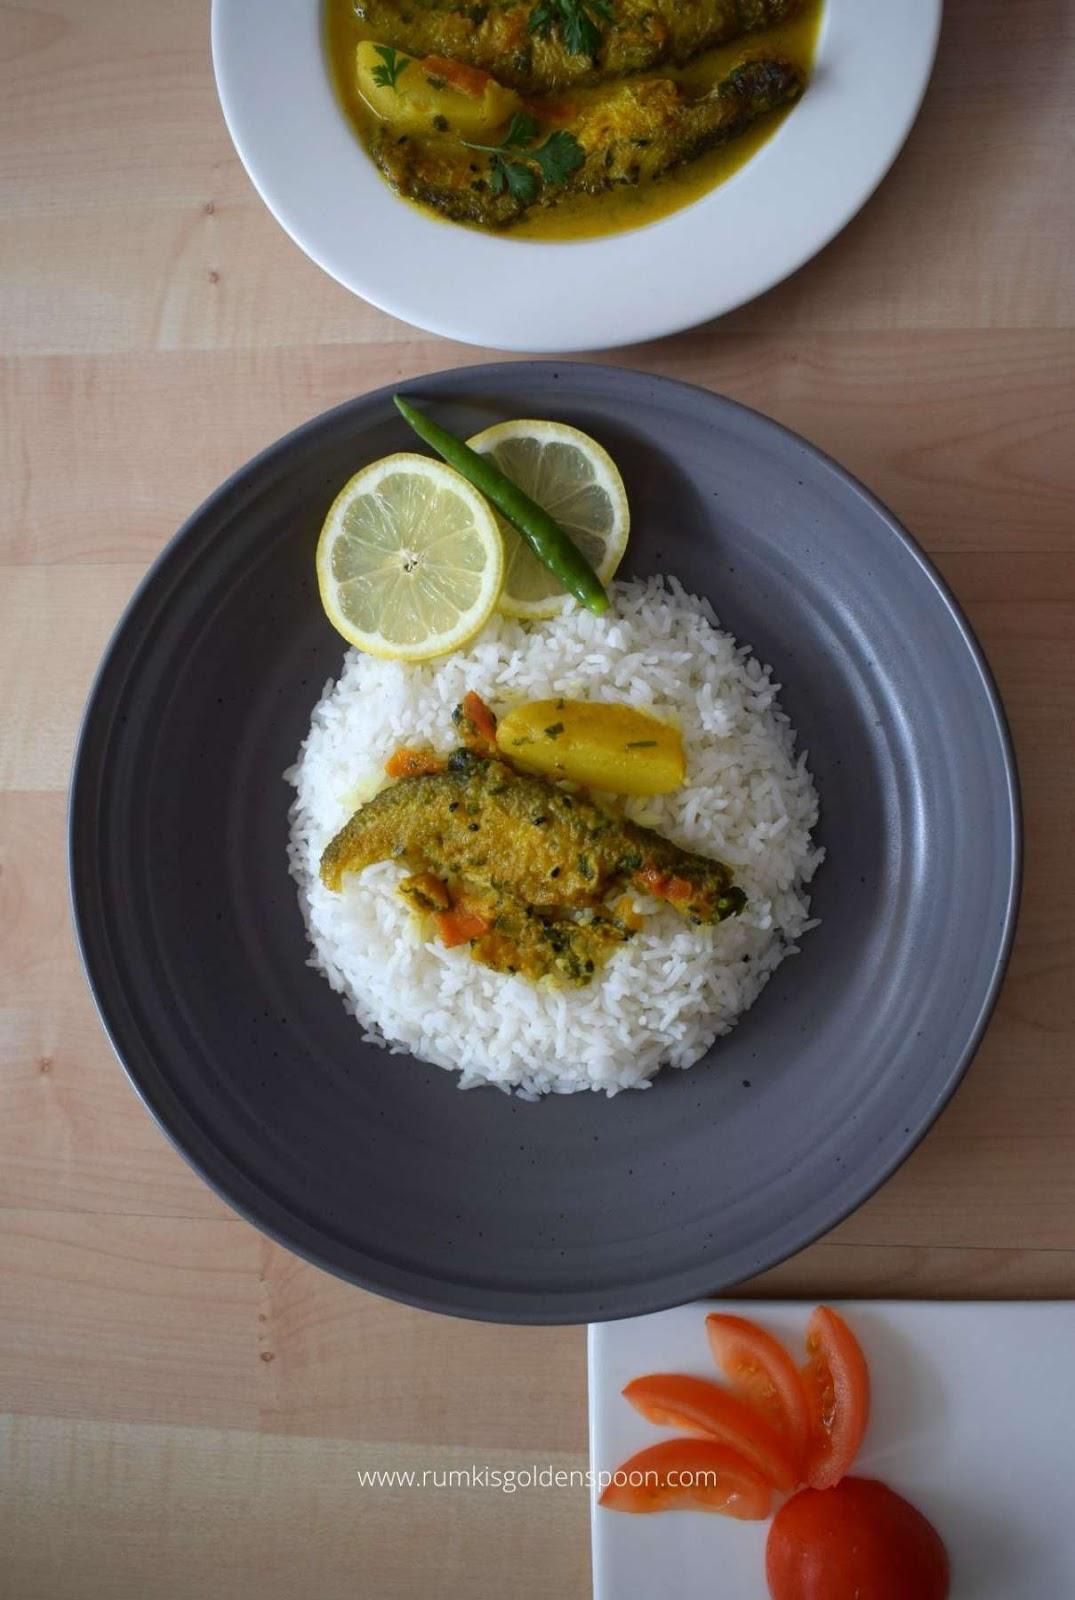 Pabda Macher Jhol, Pabda Macher Jhol recipe, Pabda fish, Pabda fish recipe, Pabda fish recipes, Pabda fish curry recipe, Pabda fish curry, pabda fish curry Bengali recipe, how to make pabda fish curry, bengali fish curry, bengali fish curry recipe, recipe for bengali fish curry, Bengali recipe fish, Bengali recipes fish, recipe for bengali fish curry, Bengali recipe for fish, Bengali recipe of fish, Bengali fish recipe, macher jhol, bengali macher jhol, bengali fish curry recipe, fish curry recipe, fish curries, bengali recipe, bengali recipes, bengali food, bengali food recipes, recipes of bengali food, traditional bengali food, bengali traditional food, traditional food of Bengali, Rumki's Golden Spoon